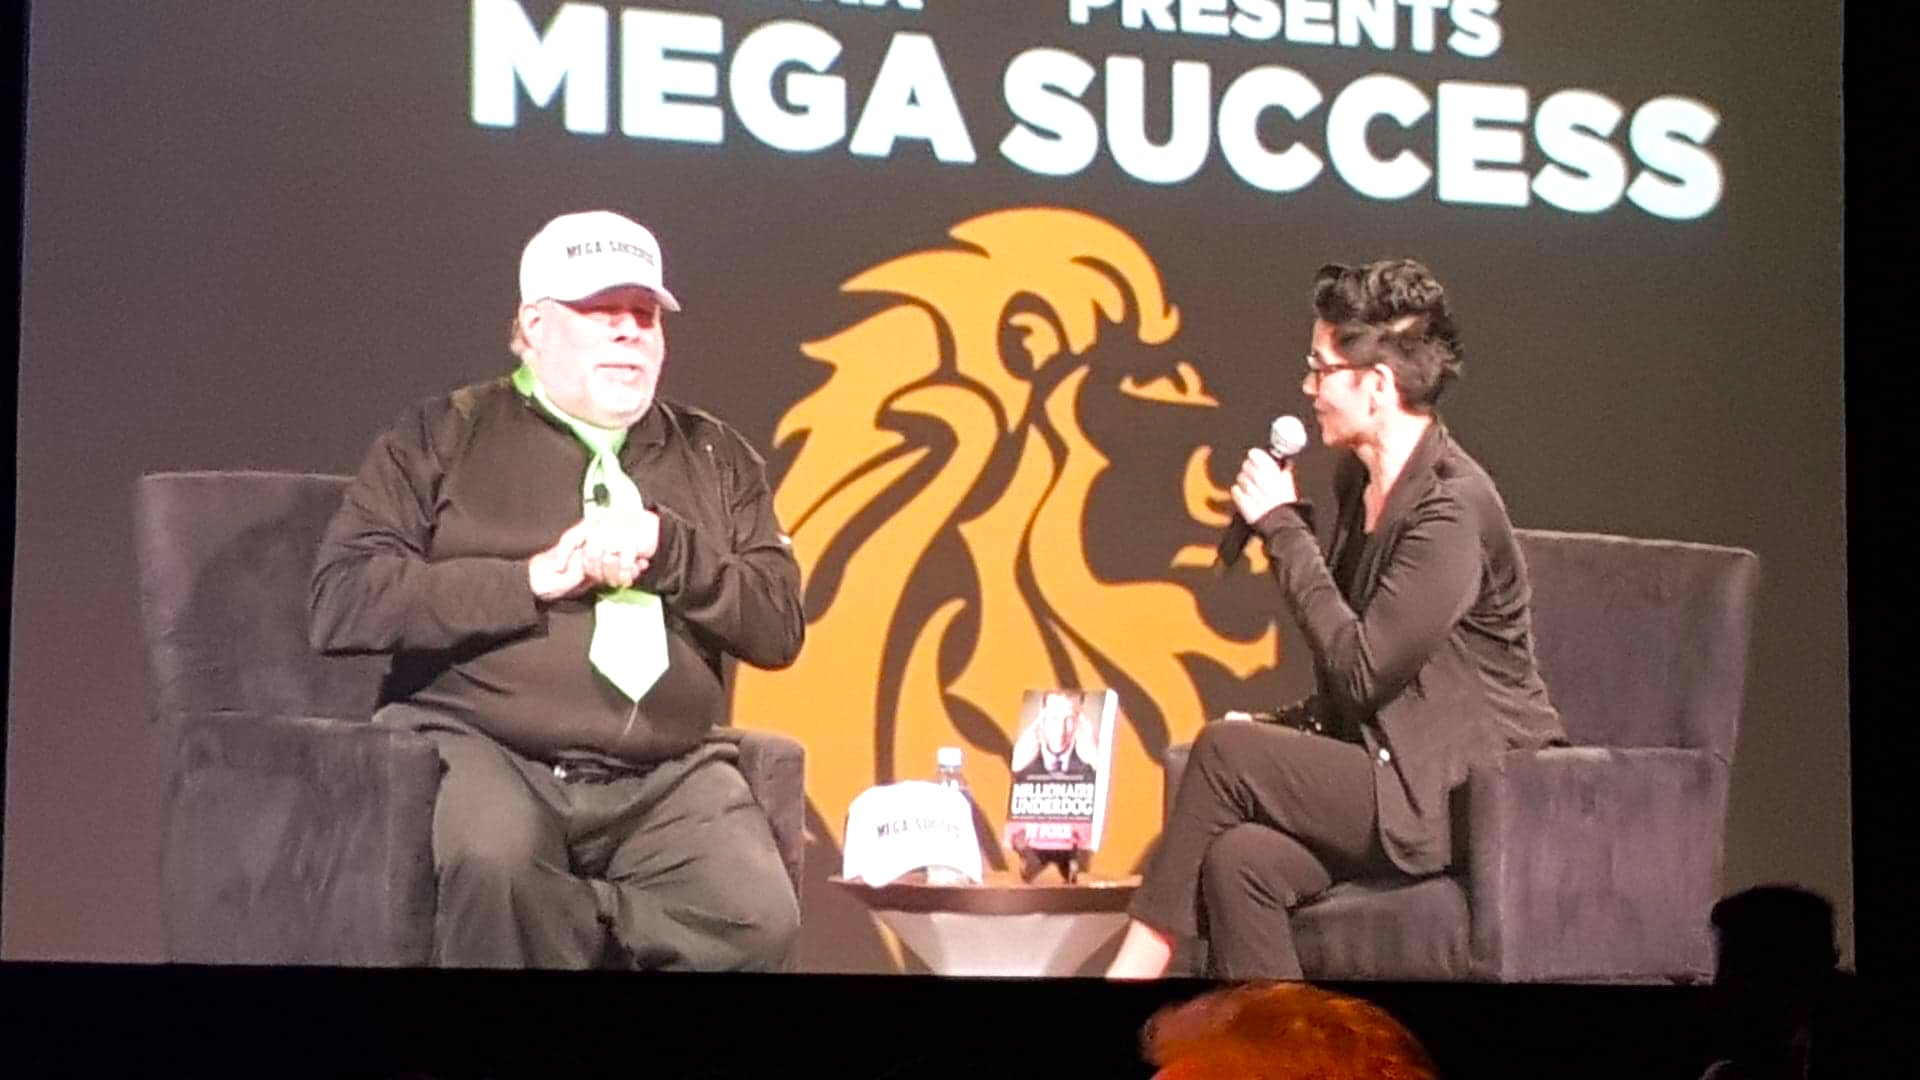 Der Schlüssel zum Erfolg ist Leidenschaft – sagt Apple Co-Founder Steve Wozniak…